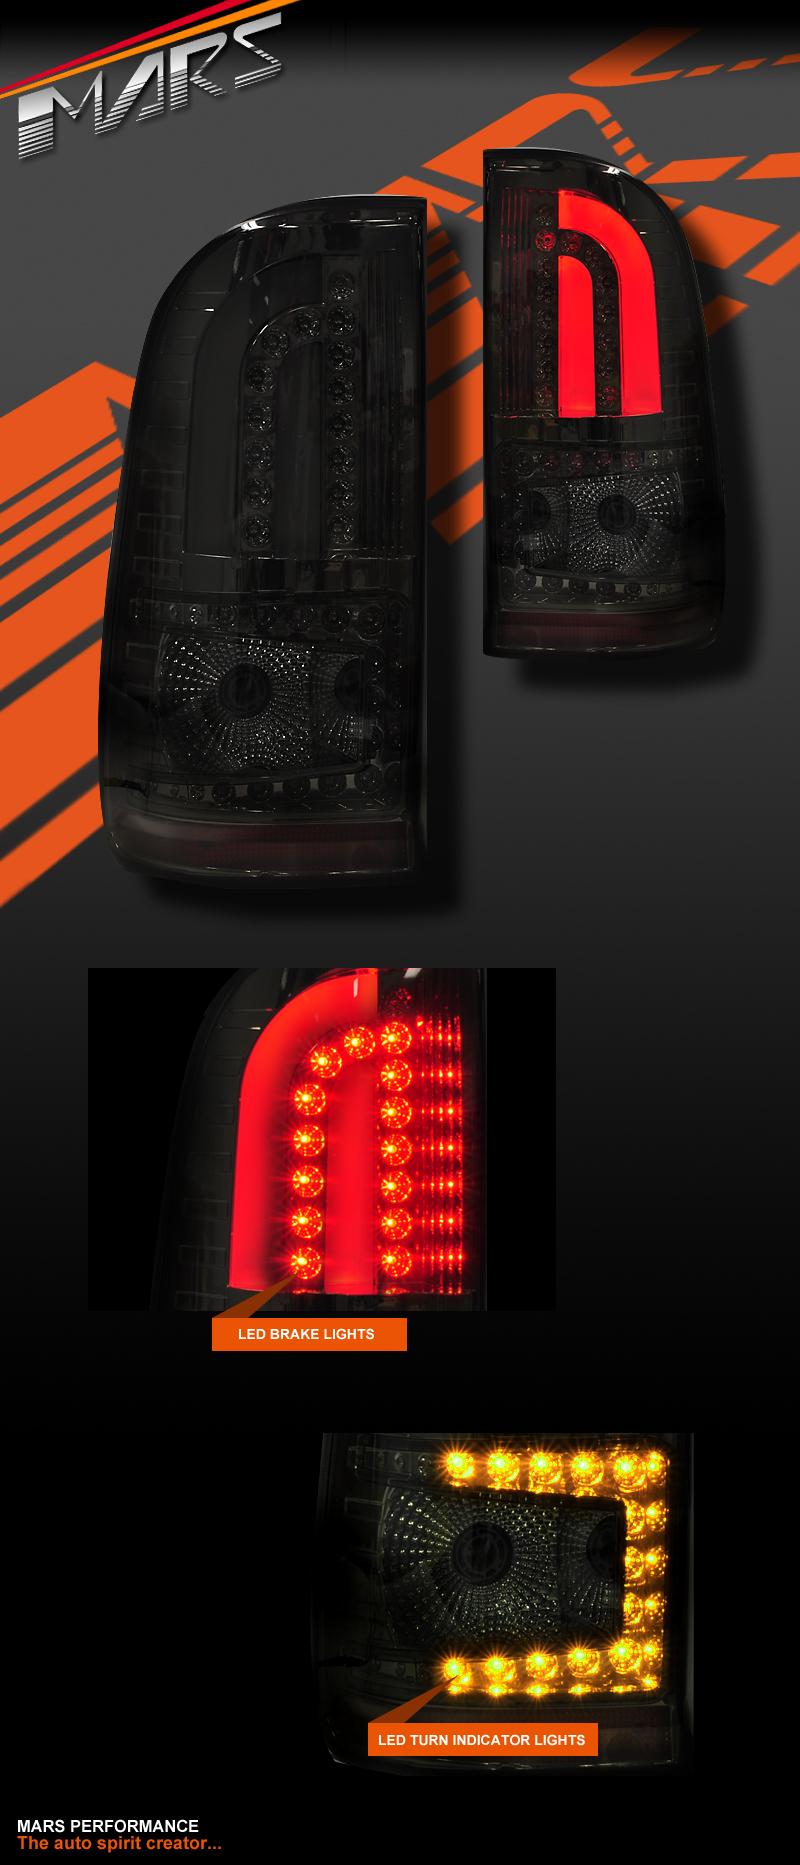 Smoked 3d Led Tail Lights For Toyota Hilux Vigo 04 15 Ute Mini Truck Pick Up Ebay